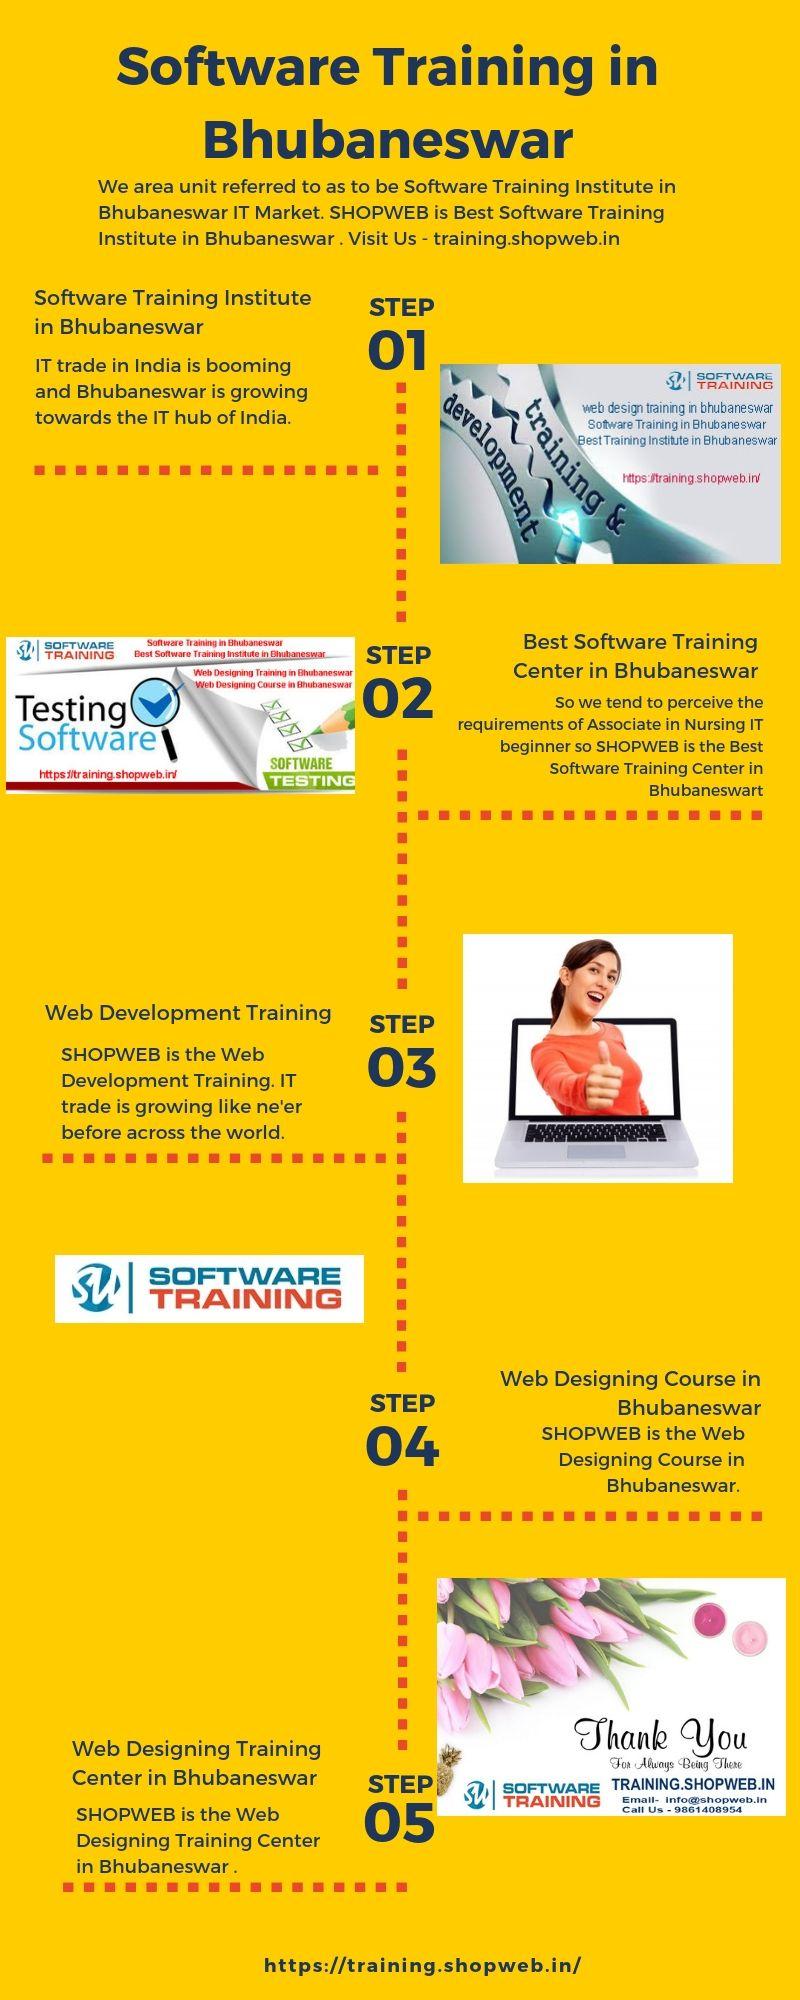 Shopweb Is The Web Designing Course In Bhubaneswar Till Now We Ve Got With Success Tr Web Design Training Web Development Training Digital Marketing Training